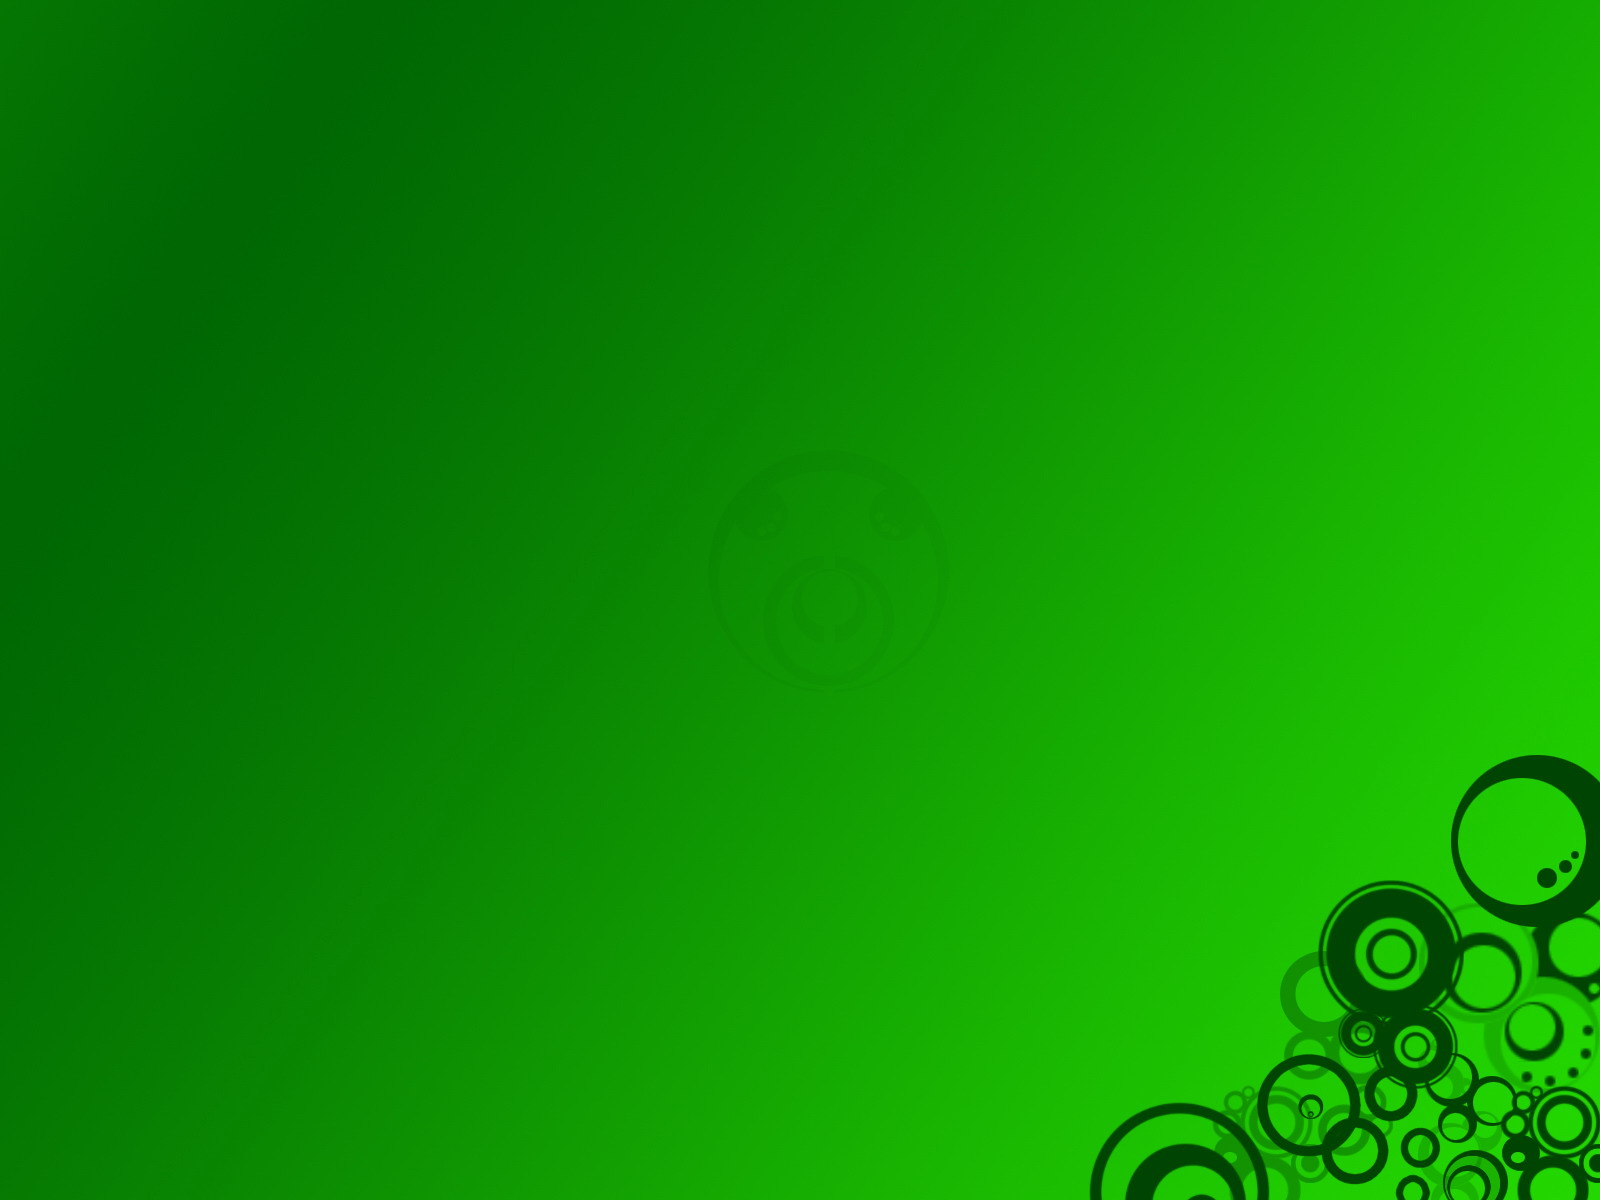 green and black wallpapers 11 hd wallpaper - hdblackwallpaper